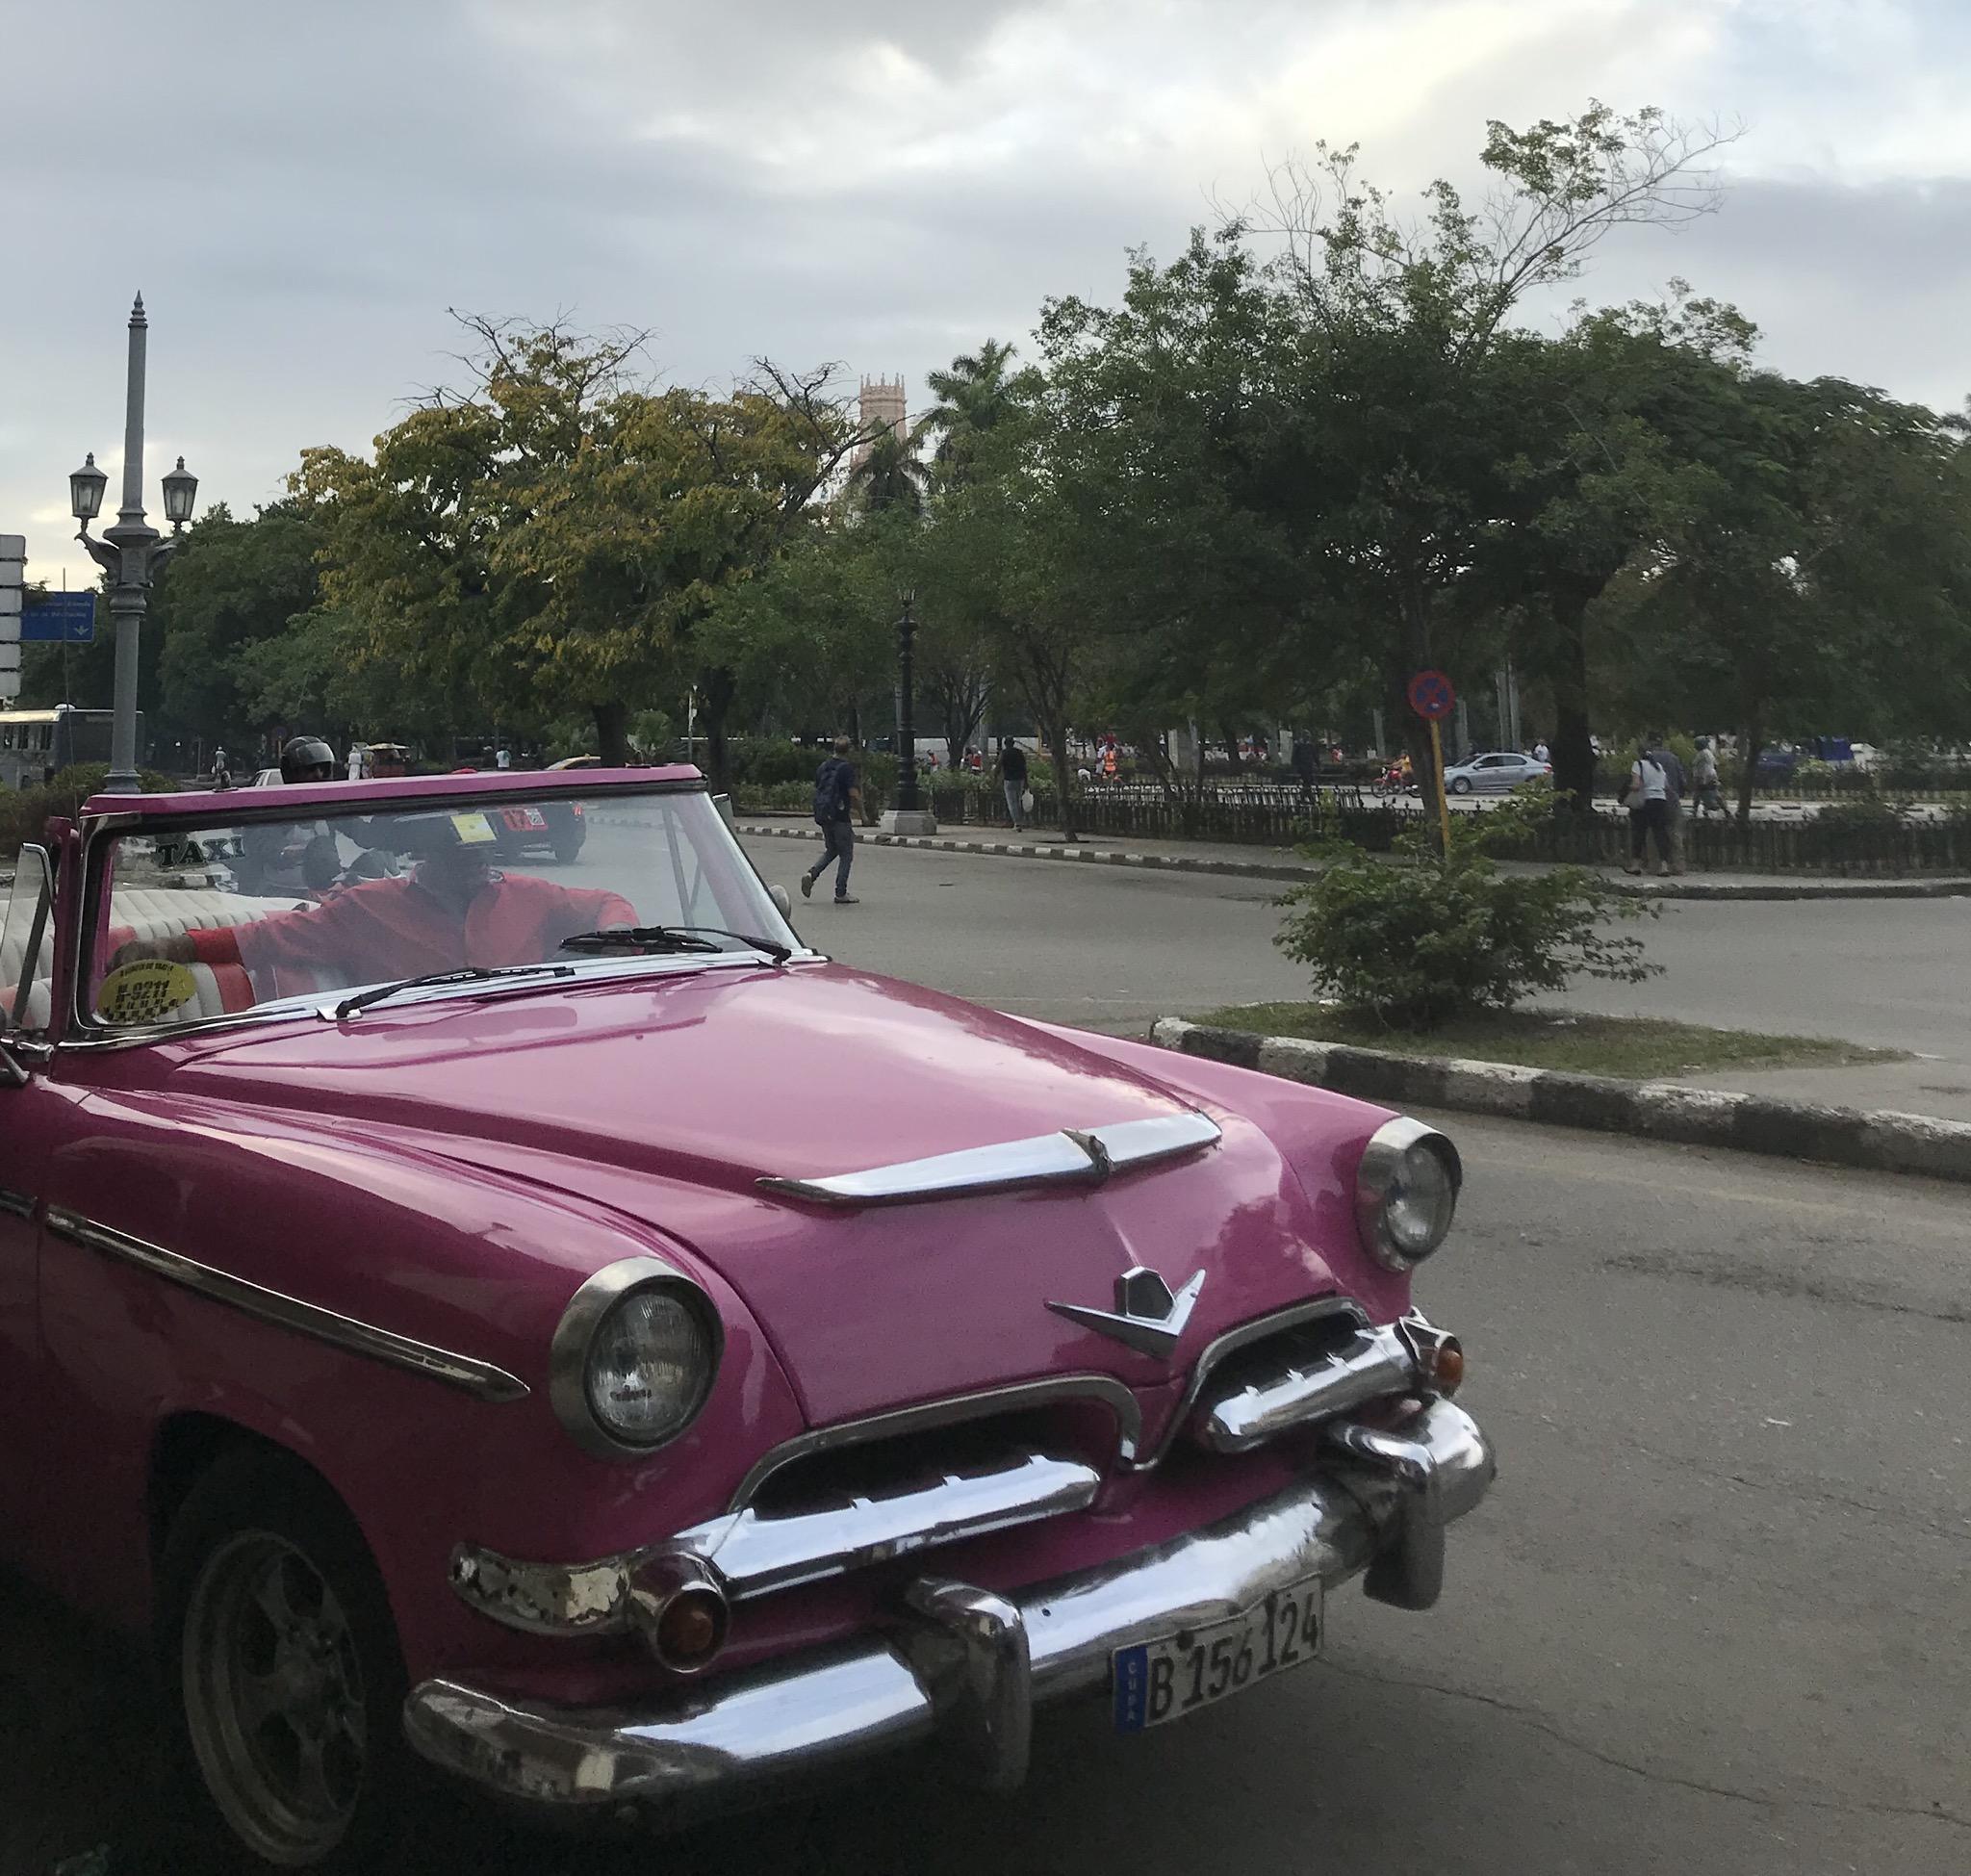 My experience in Cuba